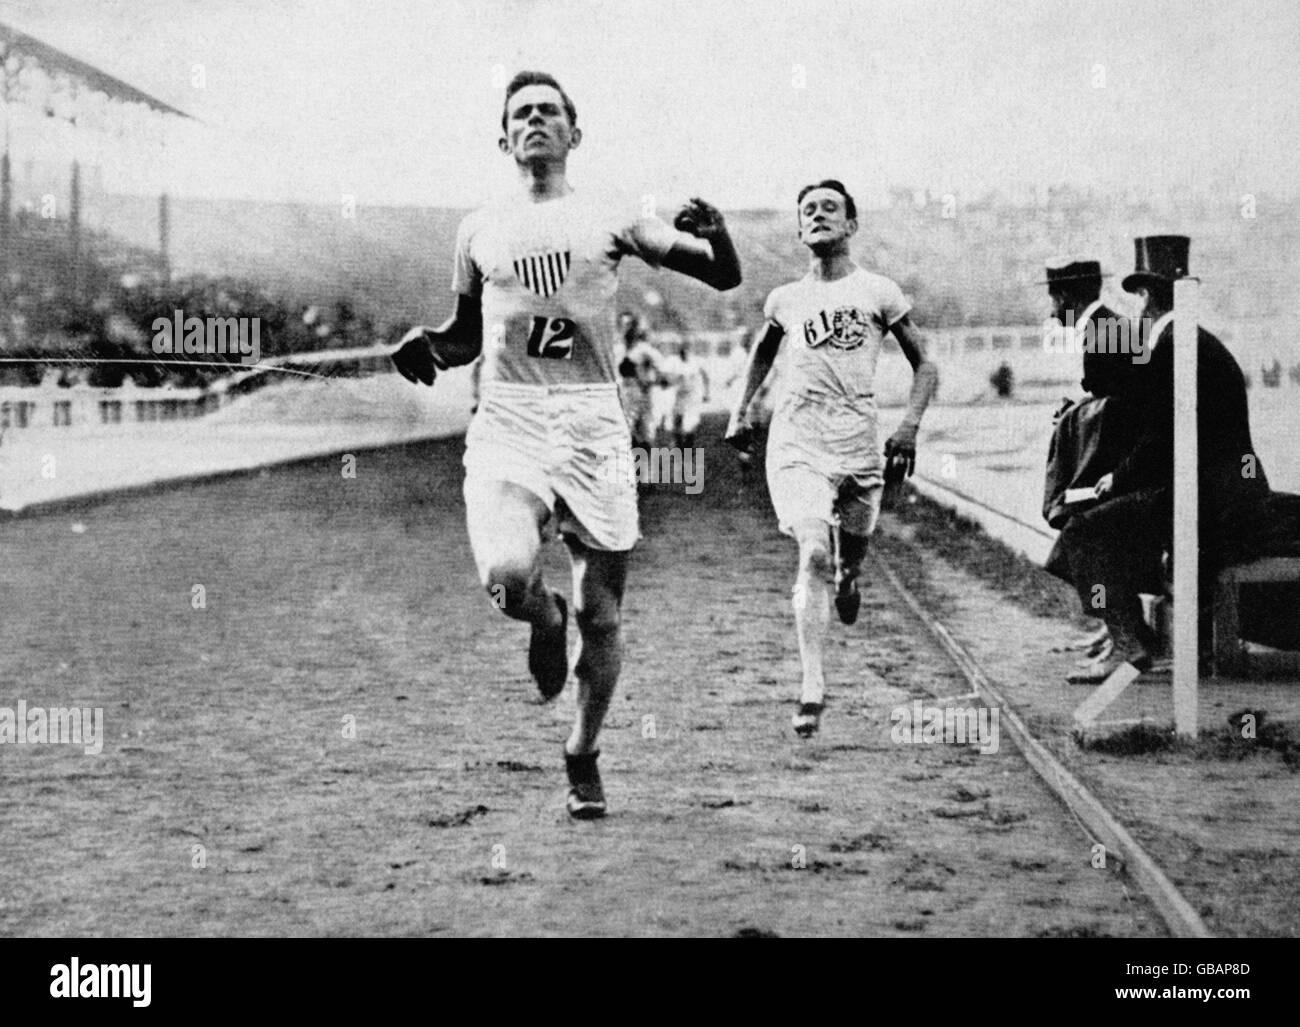 Athletics - London Olympic Games 1908 - Men's 1500m Final - Stock Image